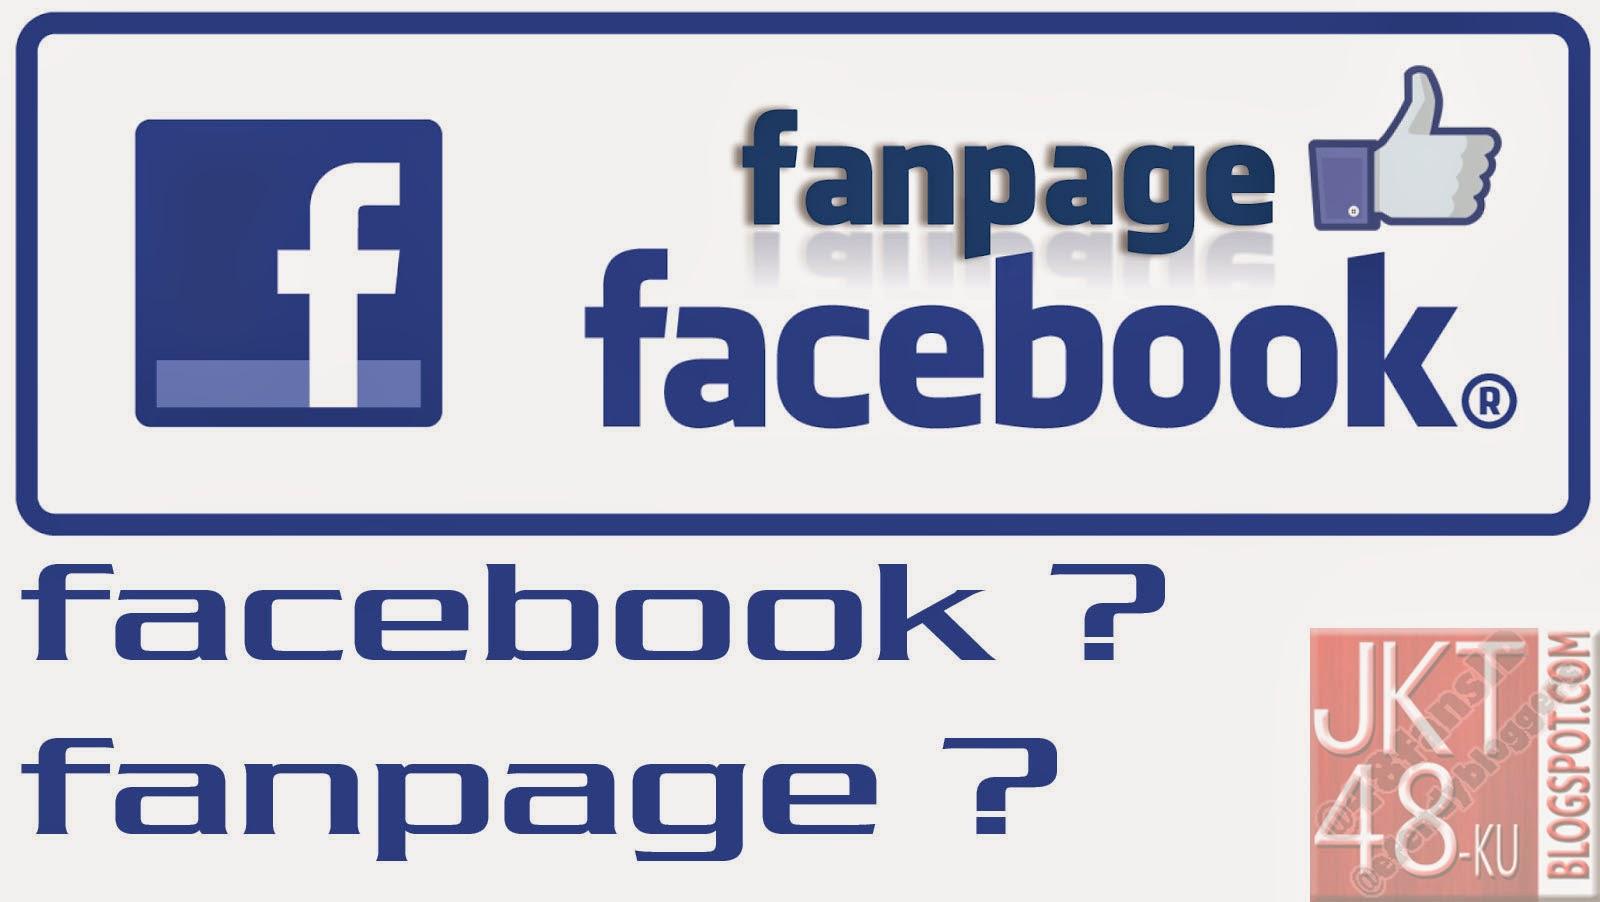 Cara Agar Fanpage Facebook Banyak Yang Like